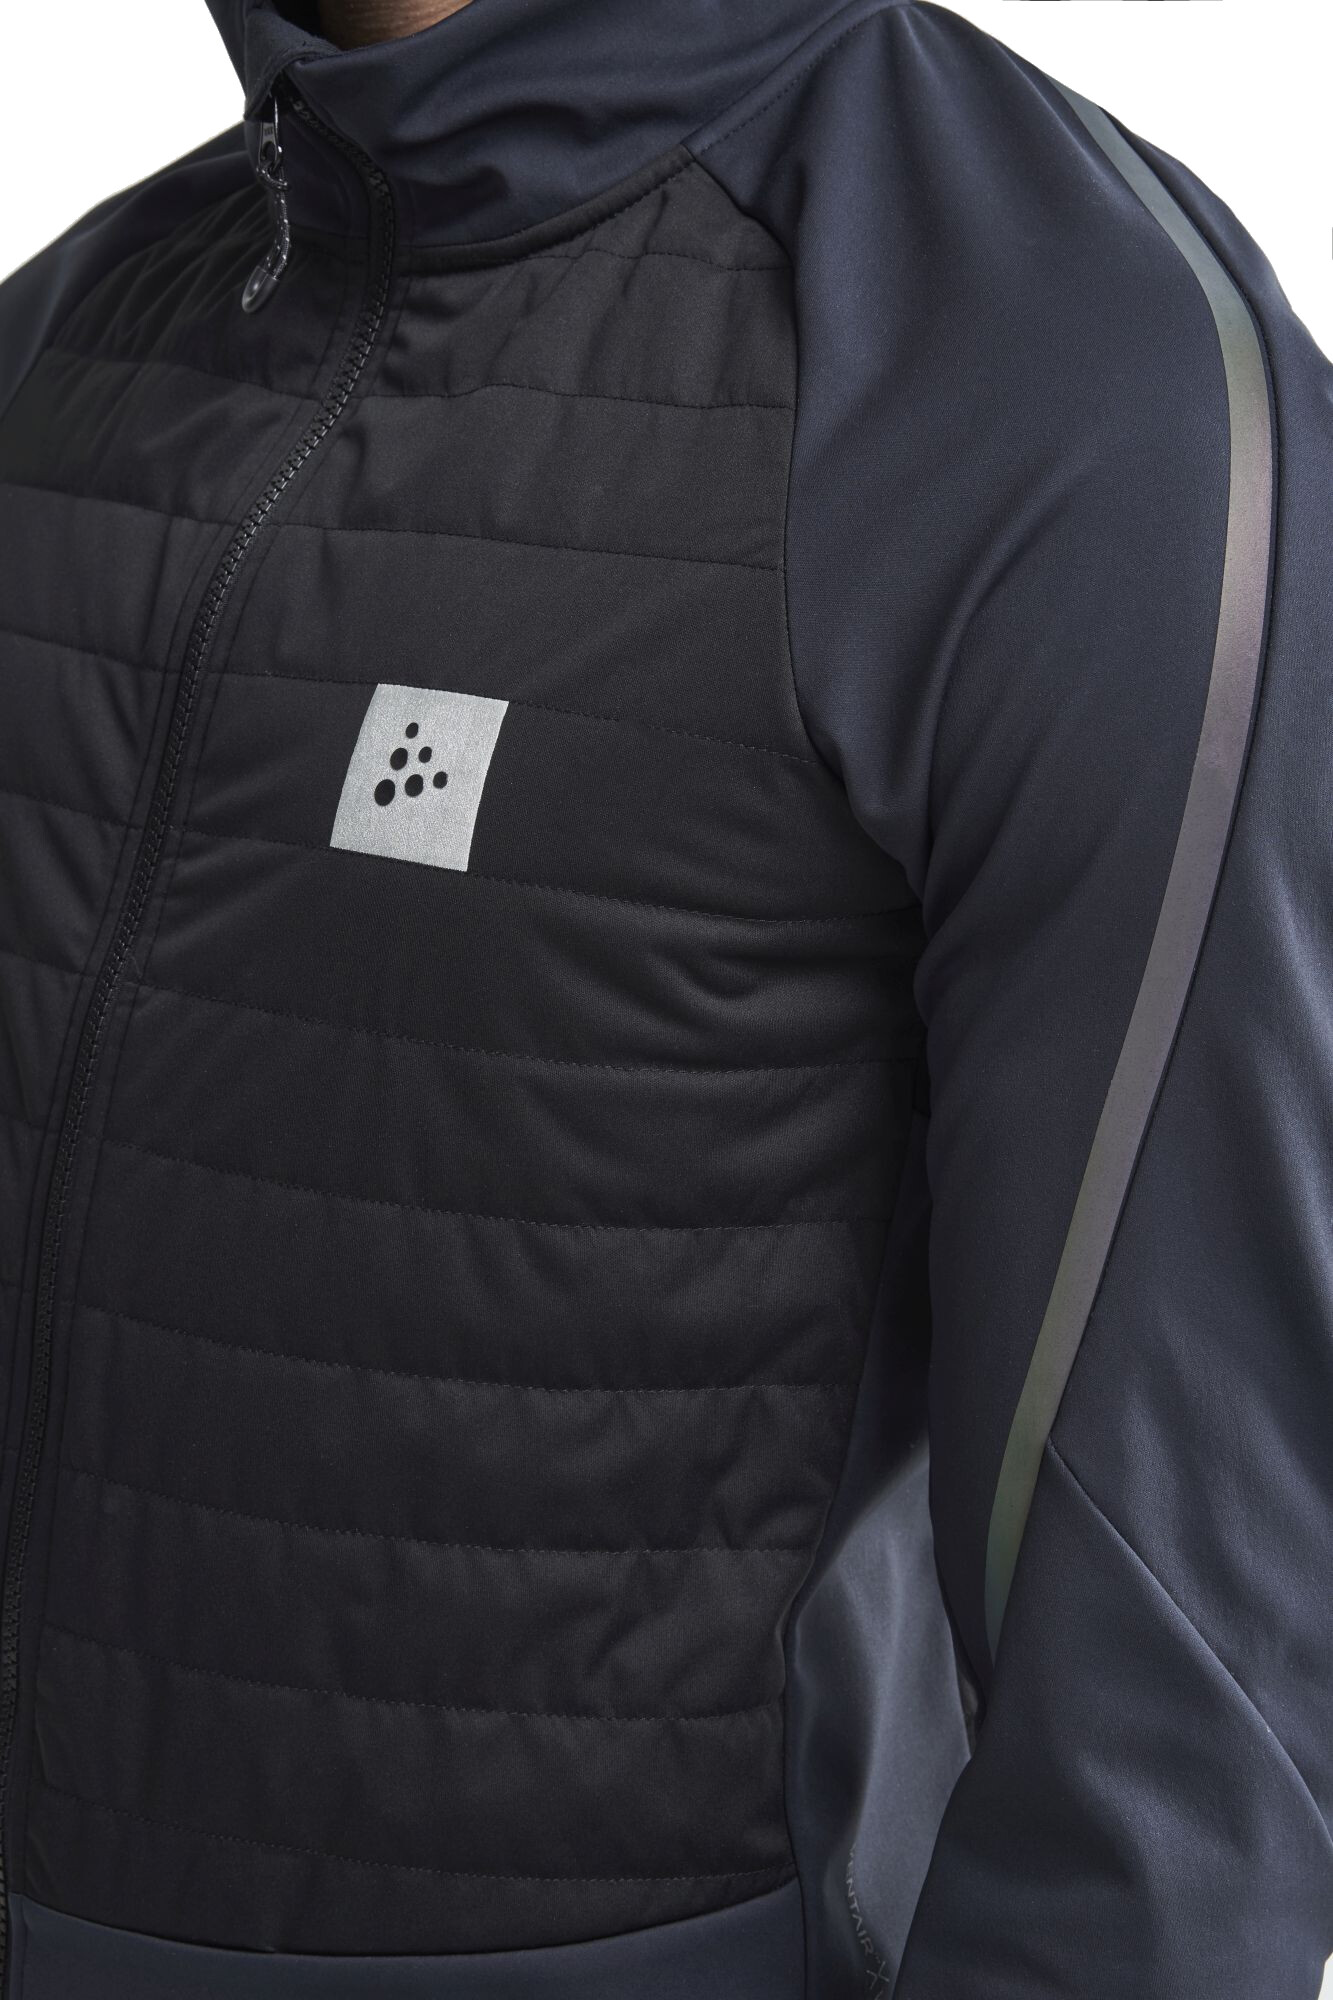 44cf77d05b1 Craft Heat Tech Primaloft Jacket Men black at Bikester.co.uk